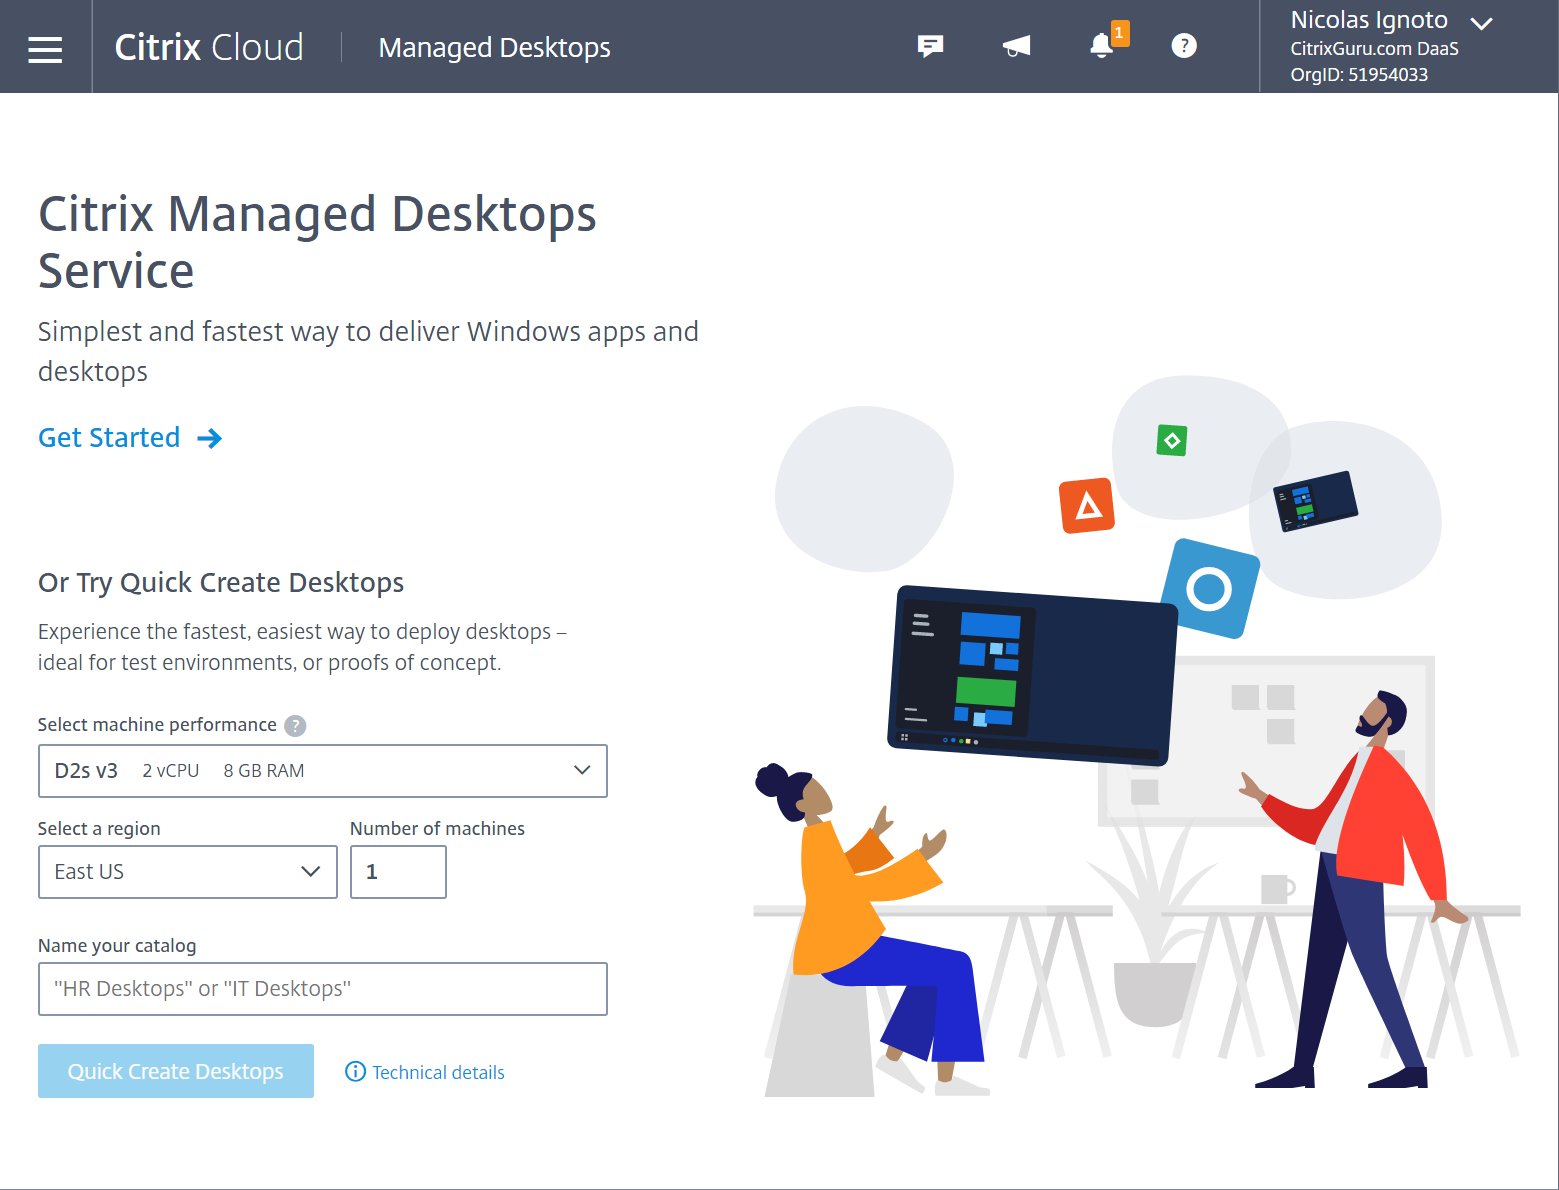 Citrix Managed Desktops Service is a glimpse into the future